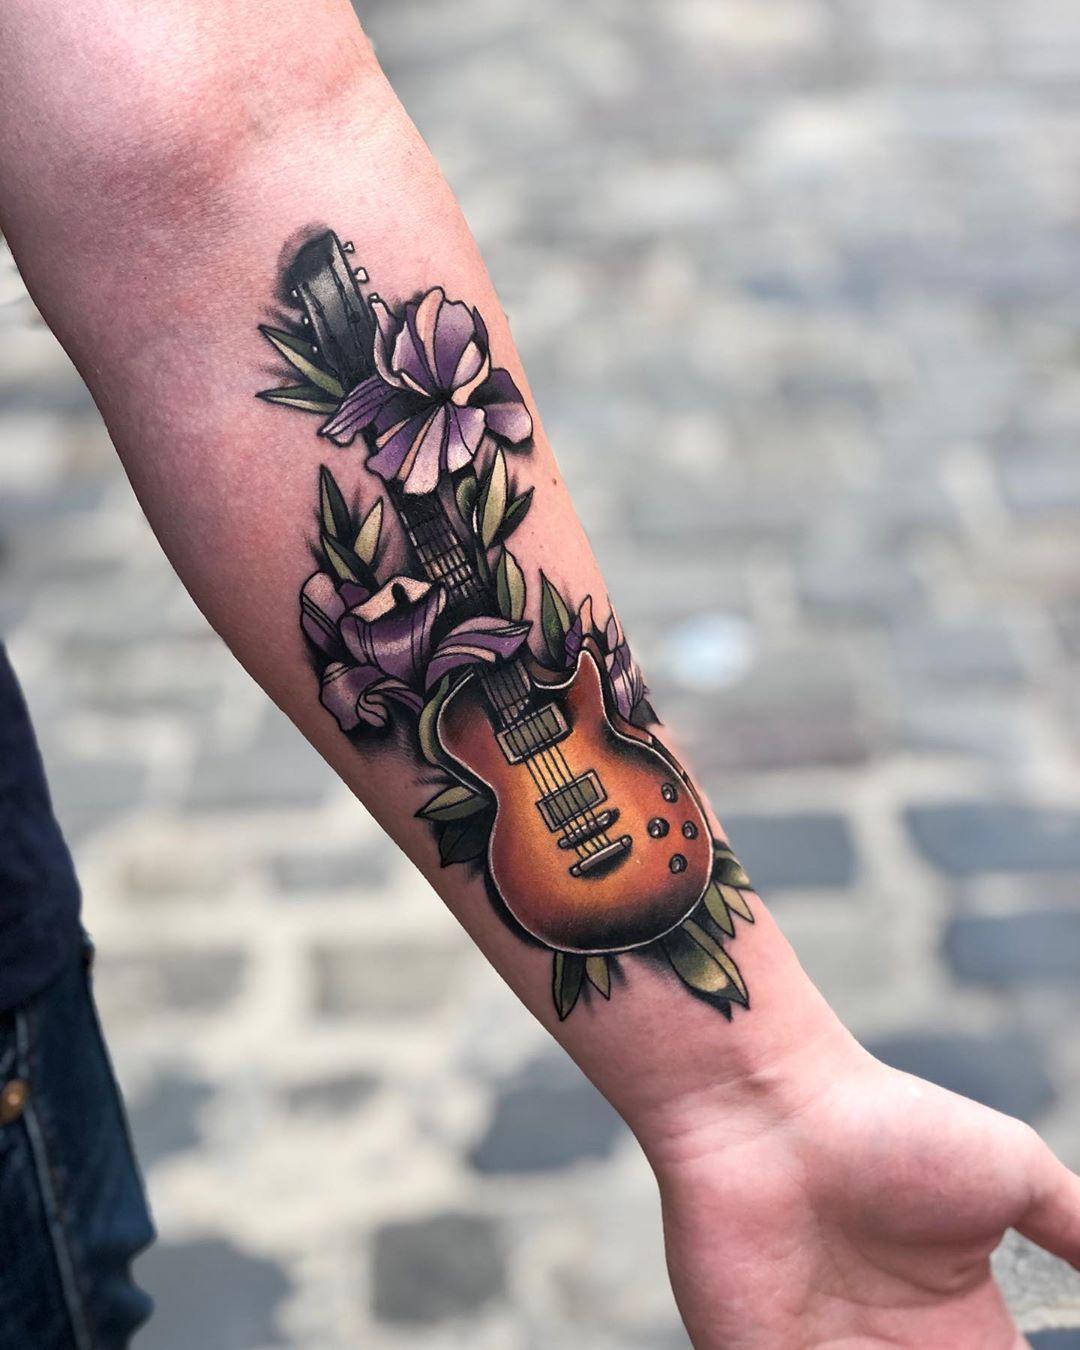 101 Awesome Guitar Tattoo Ideas You Need Tattoo Ideas Fairy Tattoo Designs Fairy Tattoo Designs Tat In 2020 Guitar Tattoo Design Guitar Tattoo Music Tattoo Designs